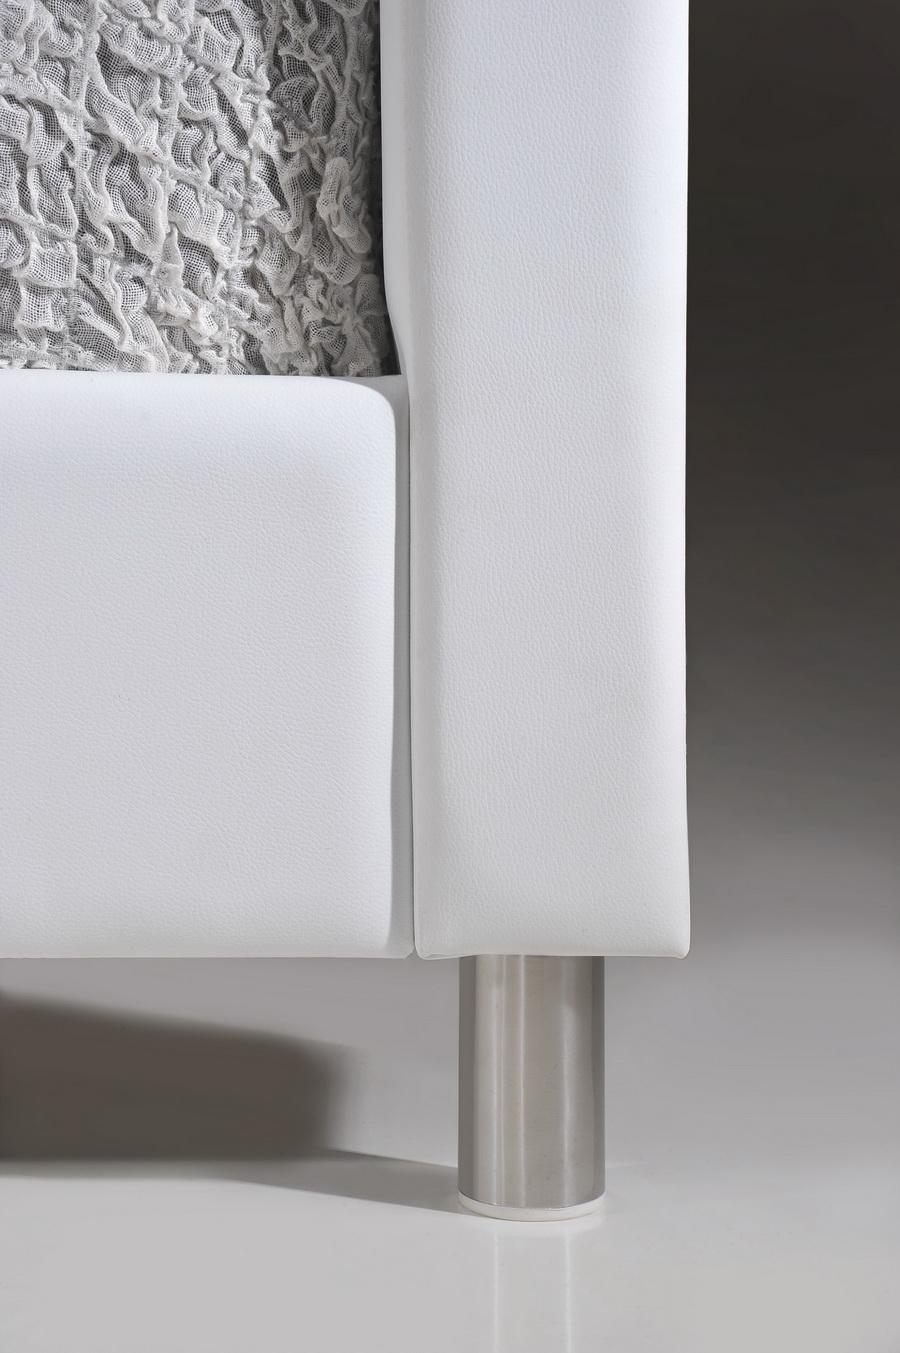 Baxton Studio Carlotta White Modern Bed with Upholstered Headboard